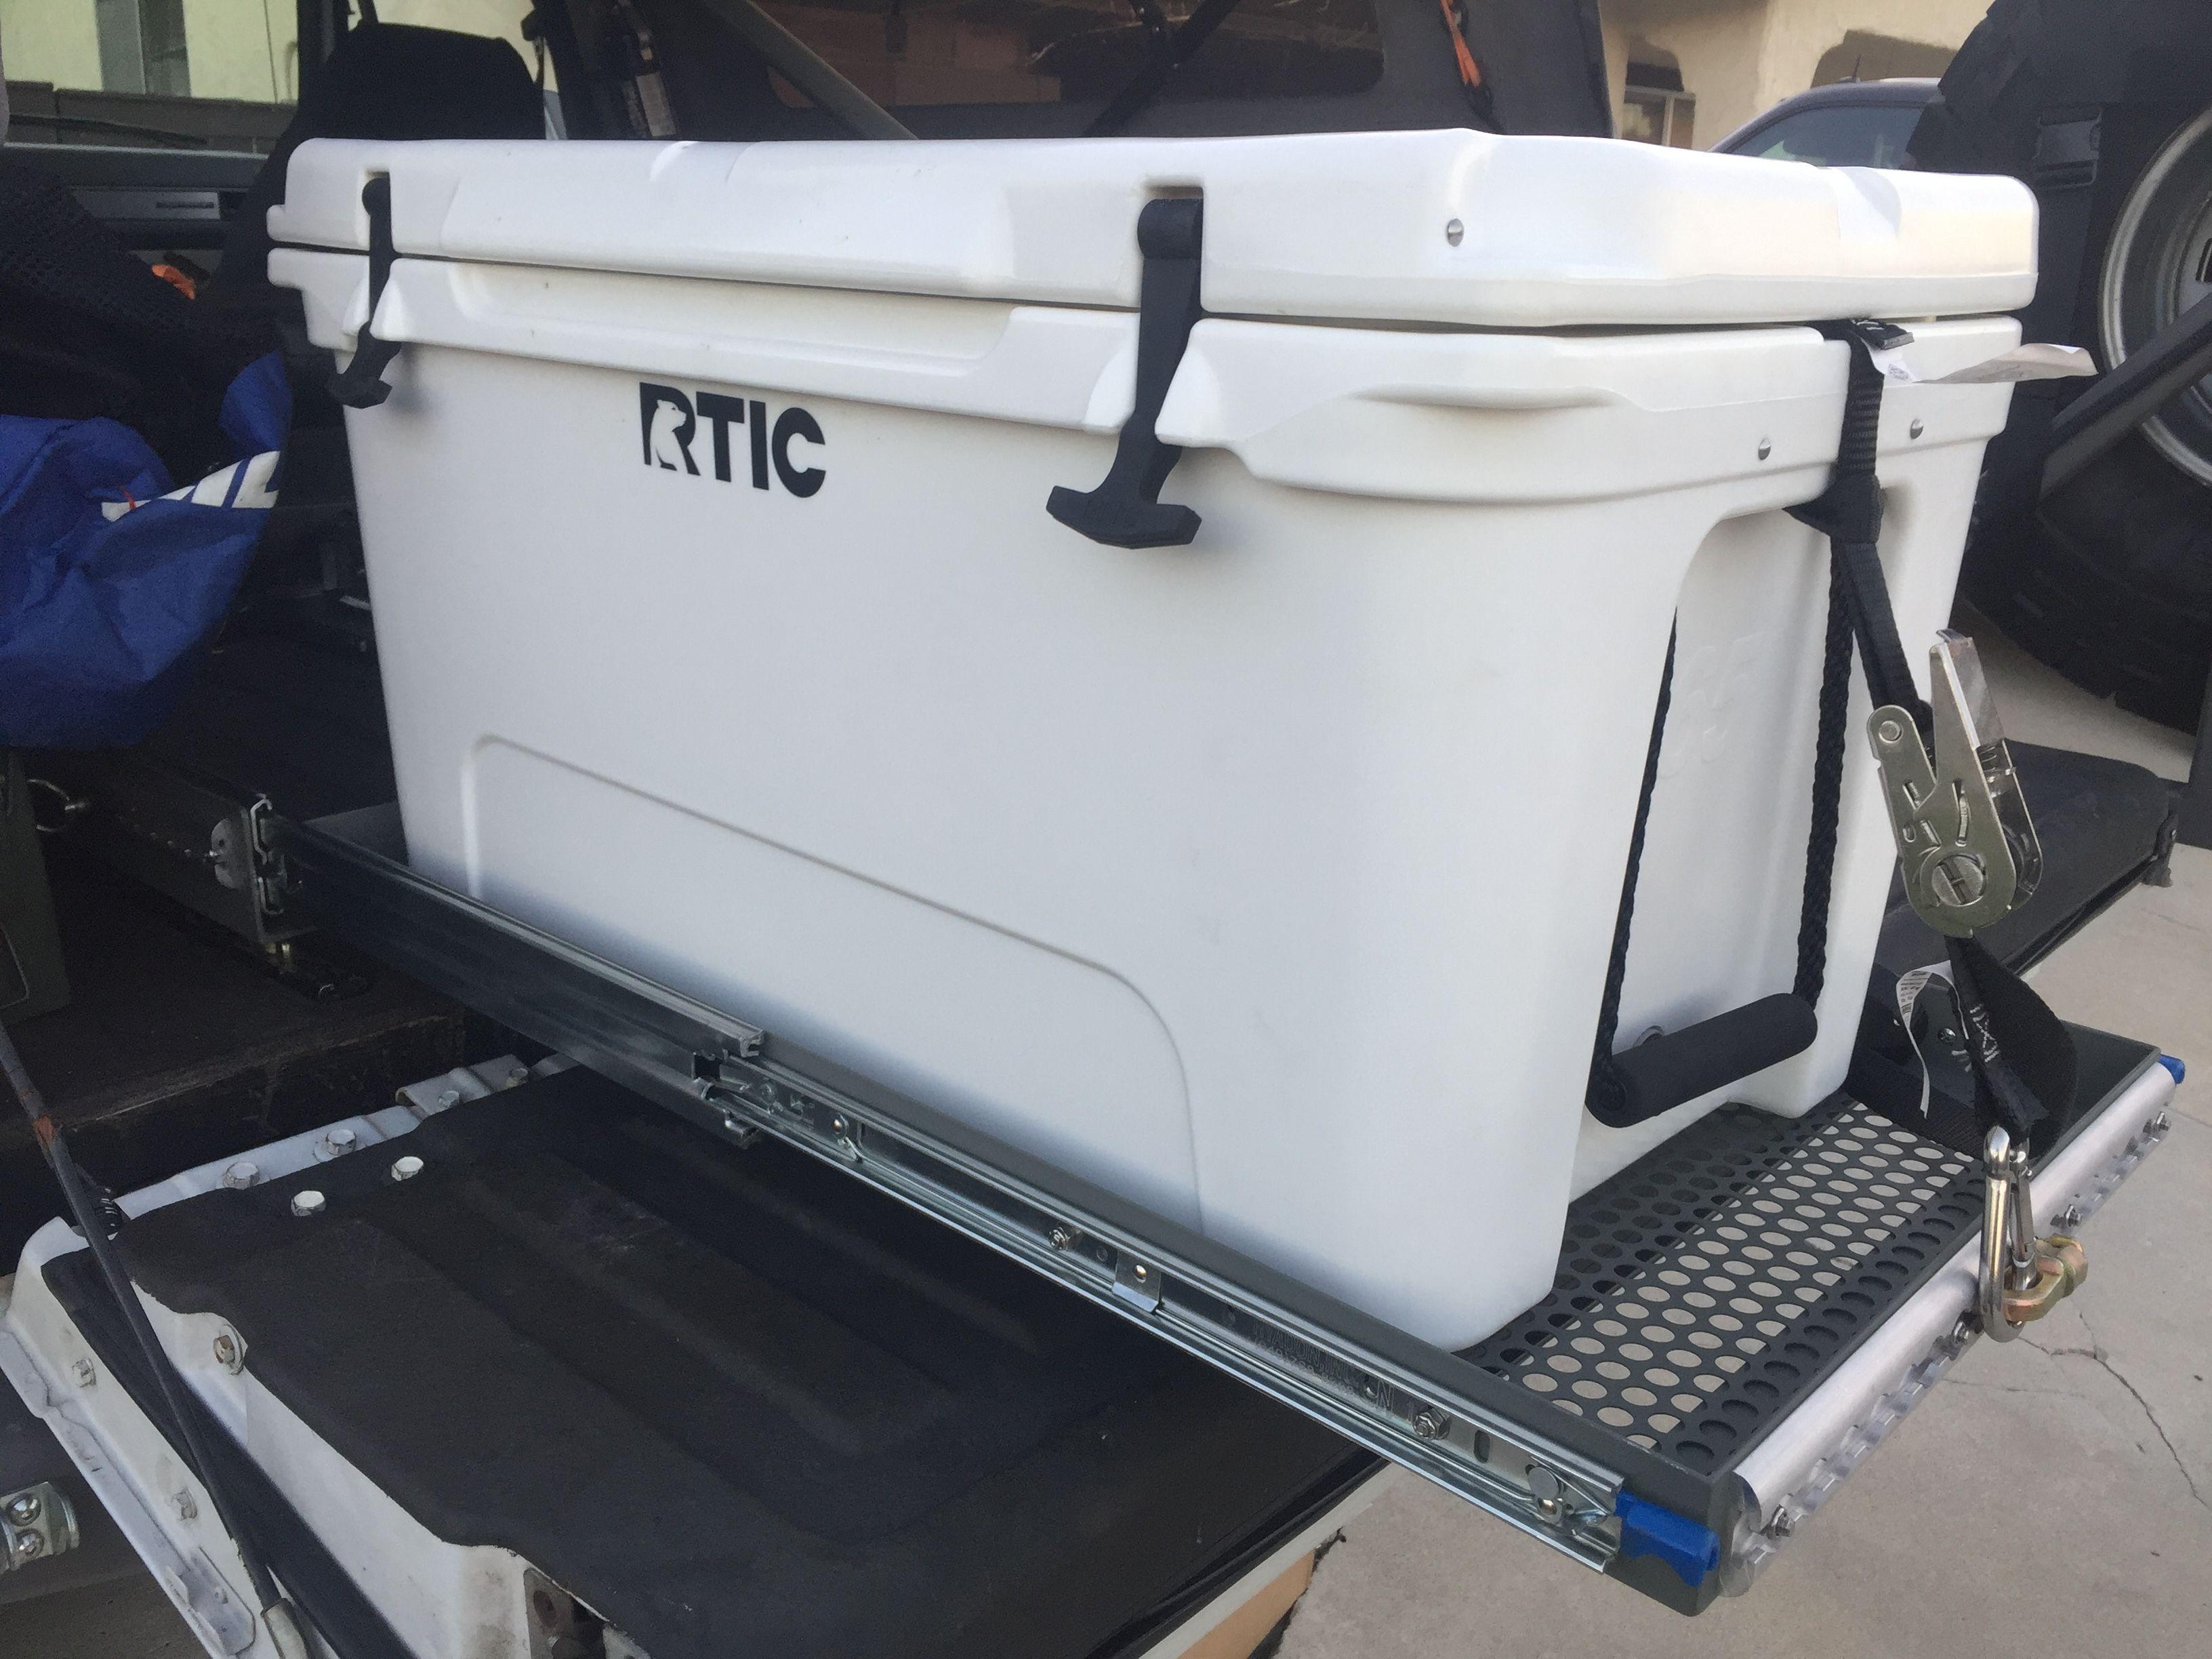 Truck Mounted Cooler Drawer With Locking Slides 65qt Cooler Diy Camping Truck Bed Cooler